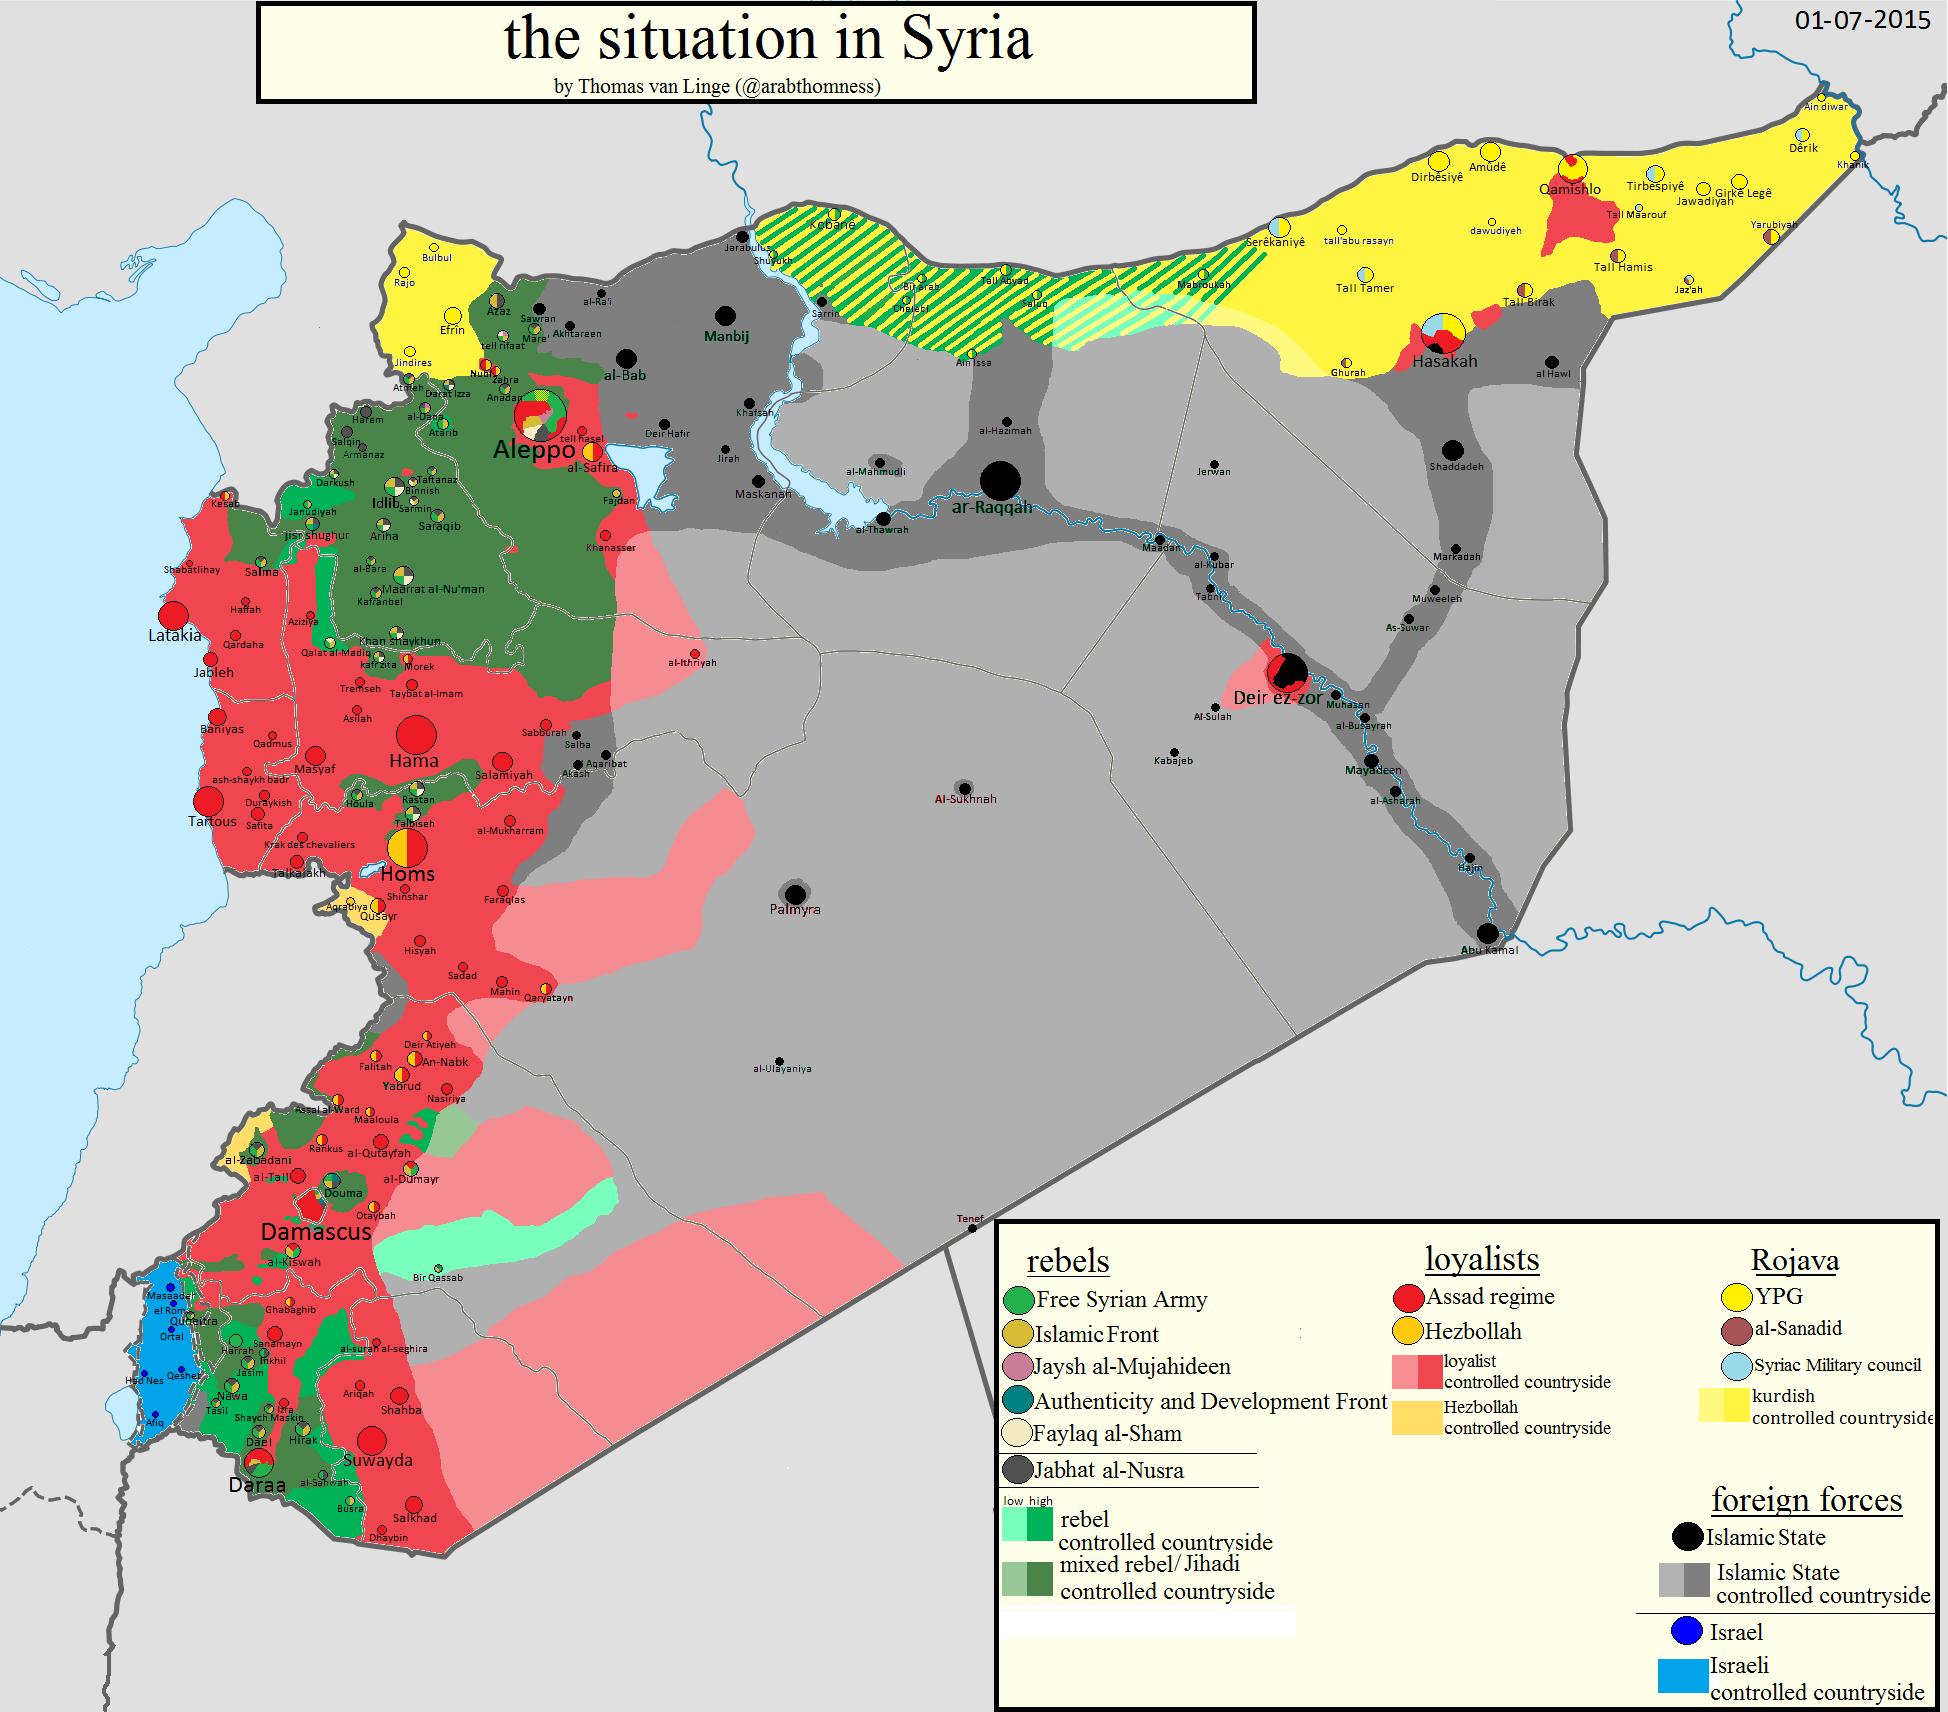 http://www.les-crises.fr/wp-content/uploads/2015/10/33-syrie-07-2015.png